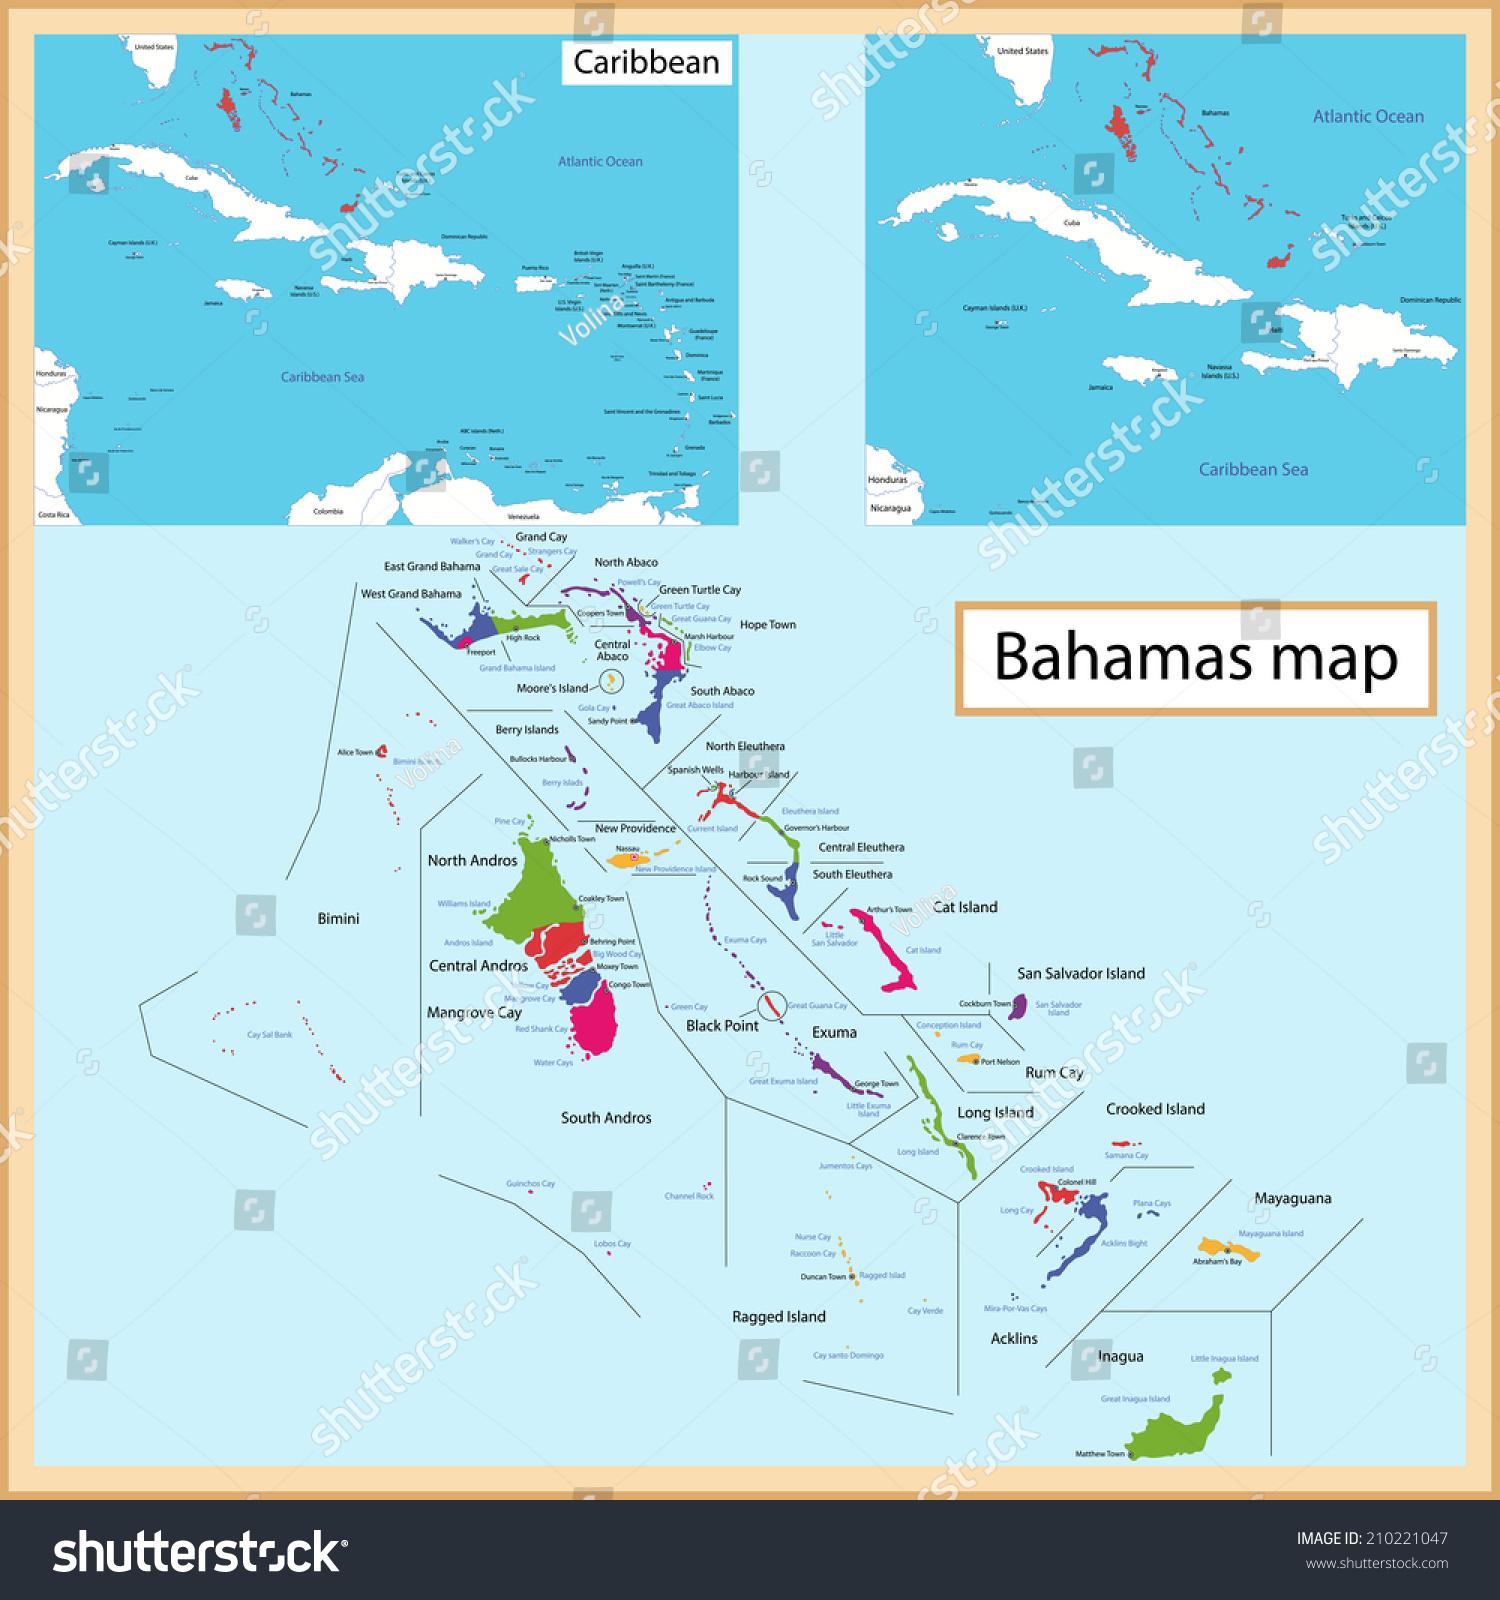 map commonwealth bahamas drawn high detail stock vector   - map of the commonwealth of the bahamas drawn with high detail and accuracy thebahamas